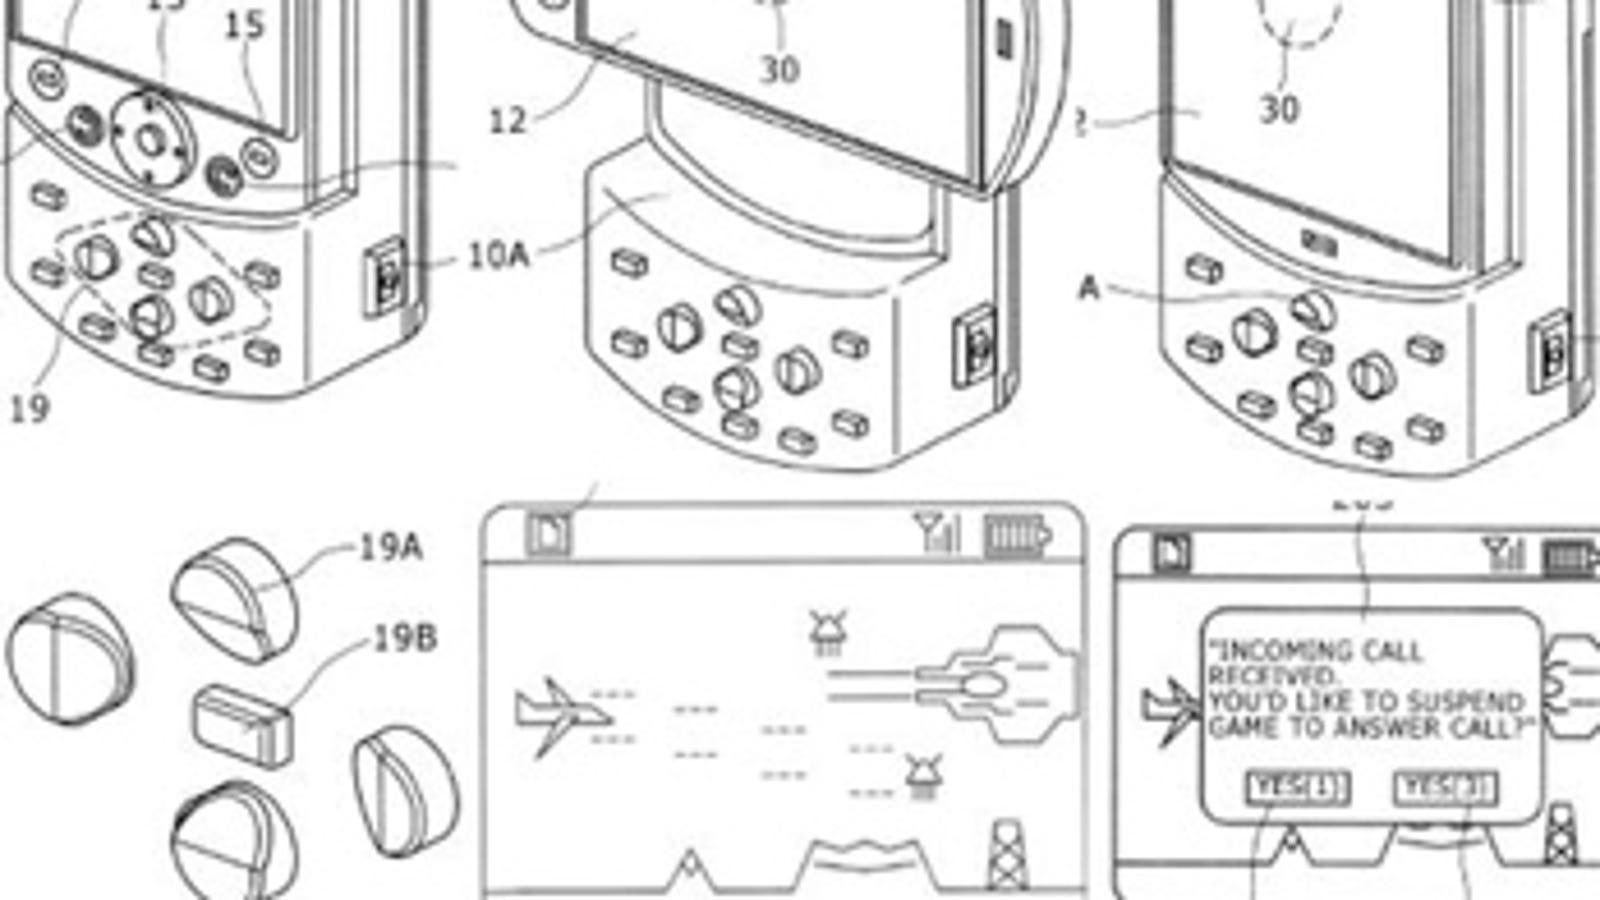 Sony ericsson shows off its psp phone design malvernweather Choice Image